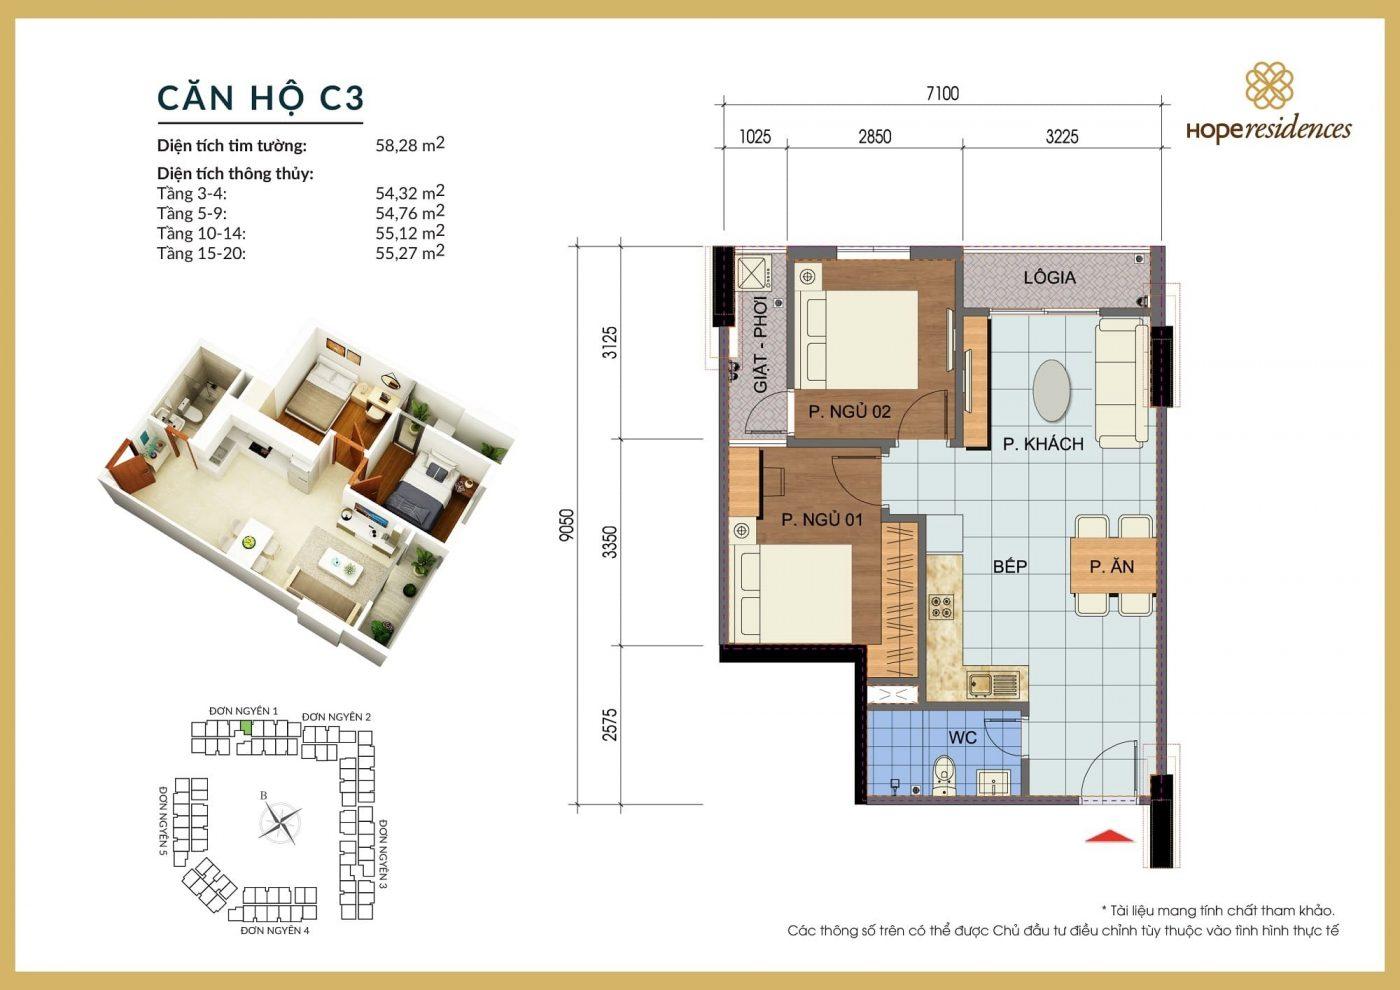 mat bang thiet ke can ho c3 hope residences